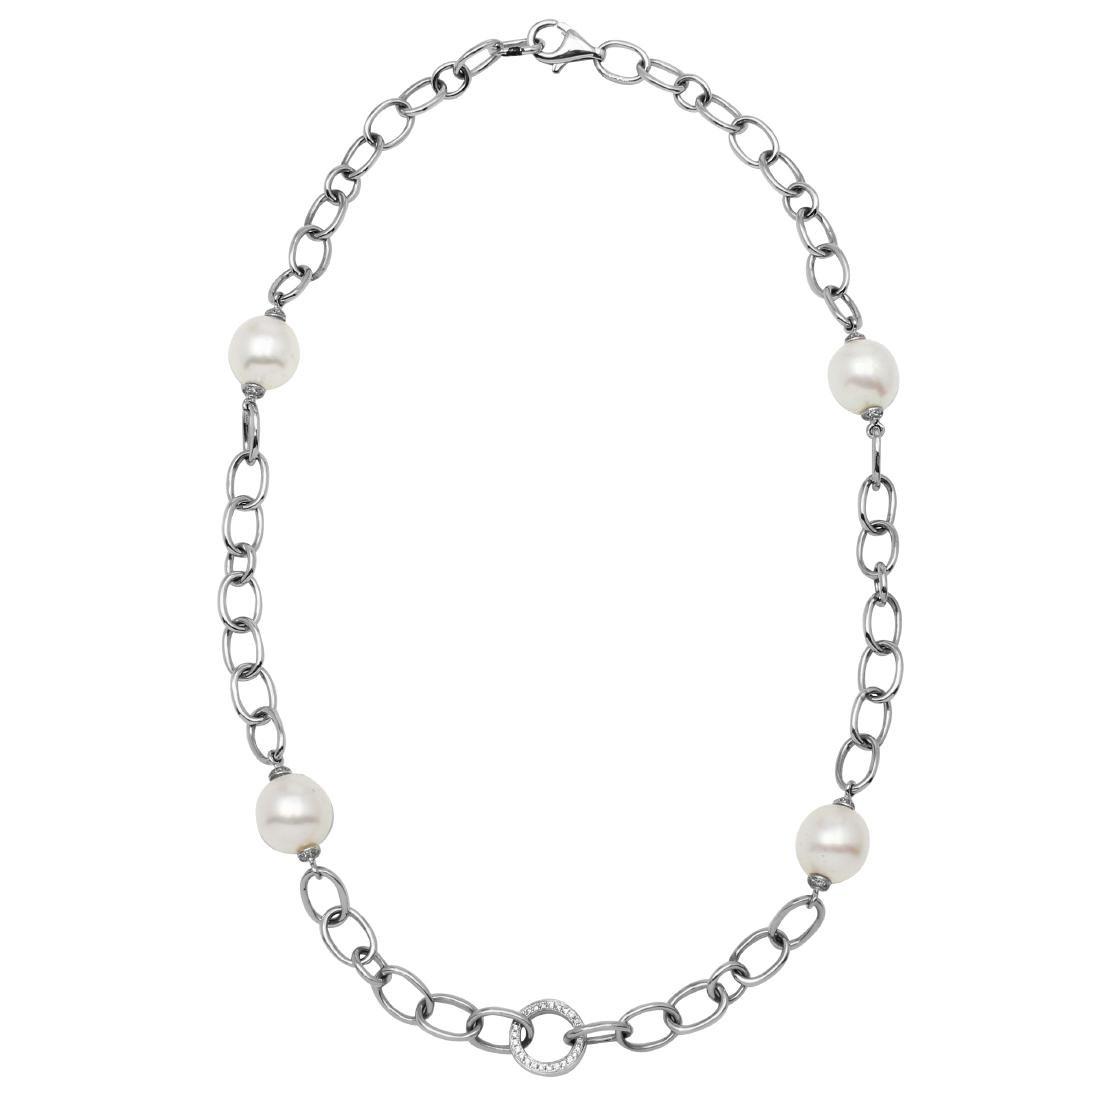 37.15 CTW Pearl & White Round Diamond Necklace 14K